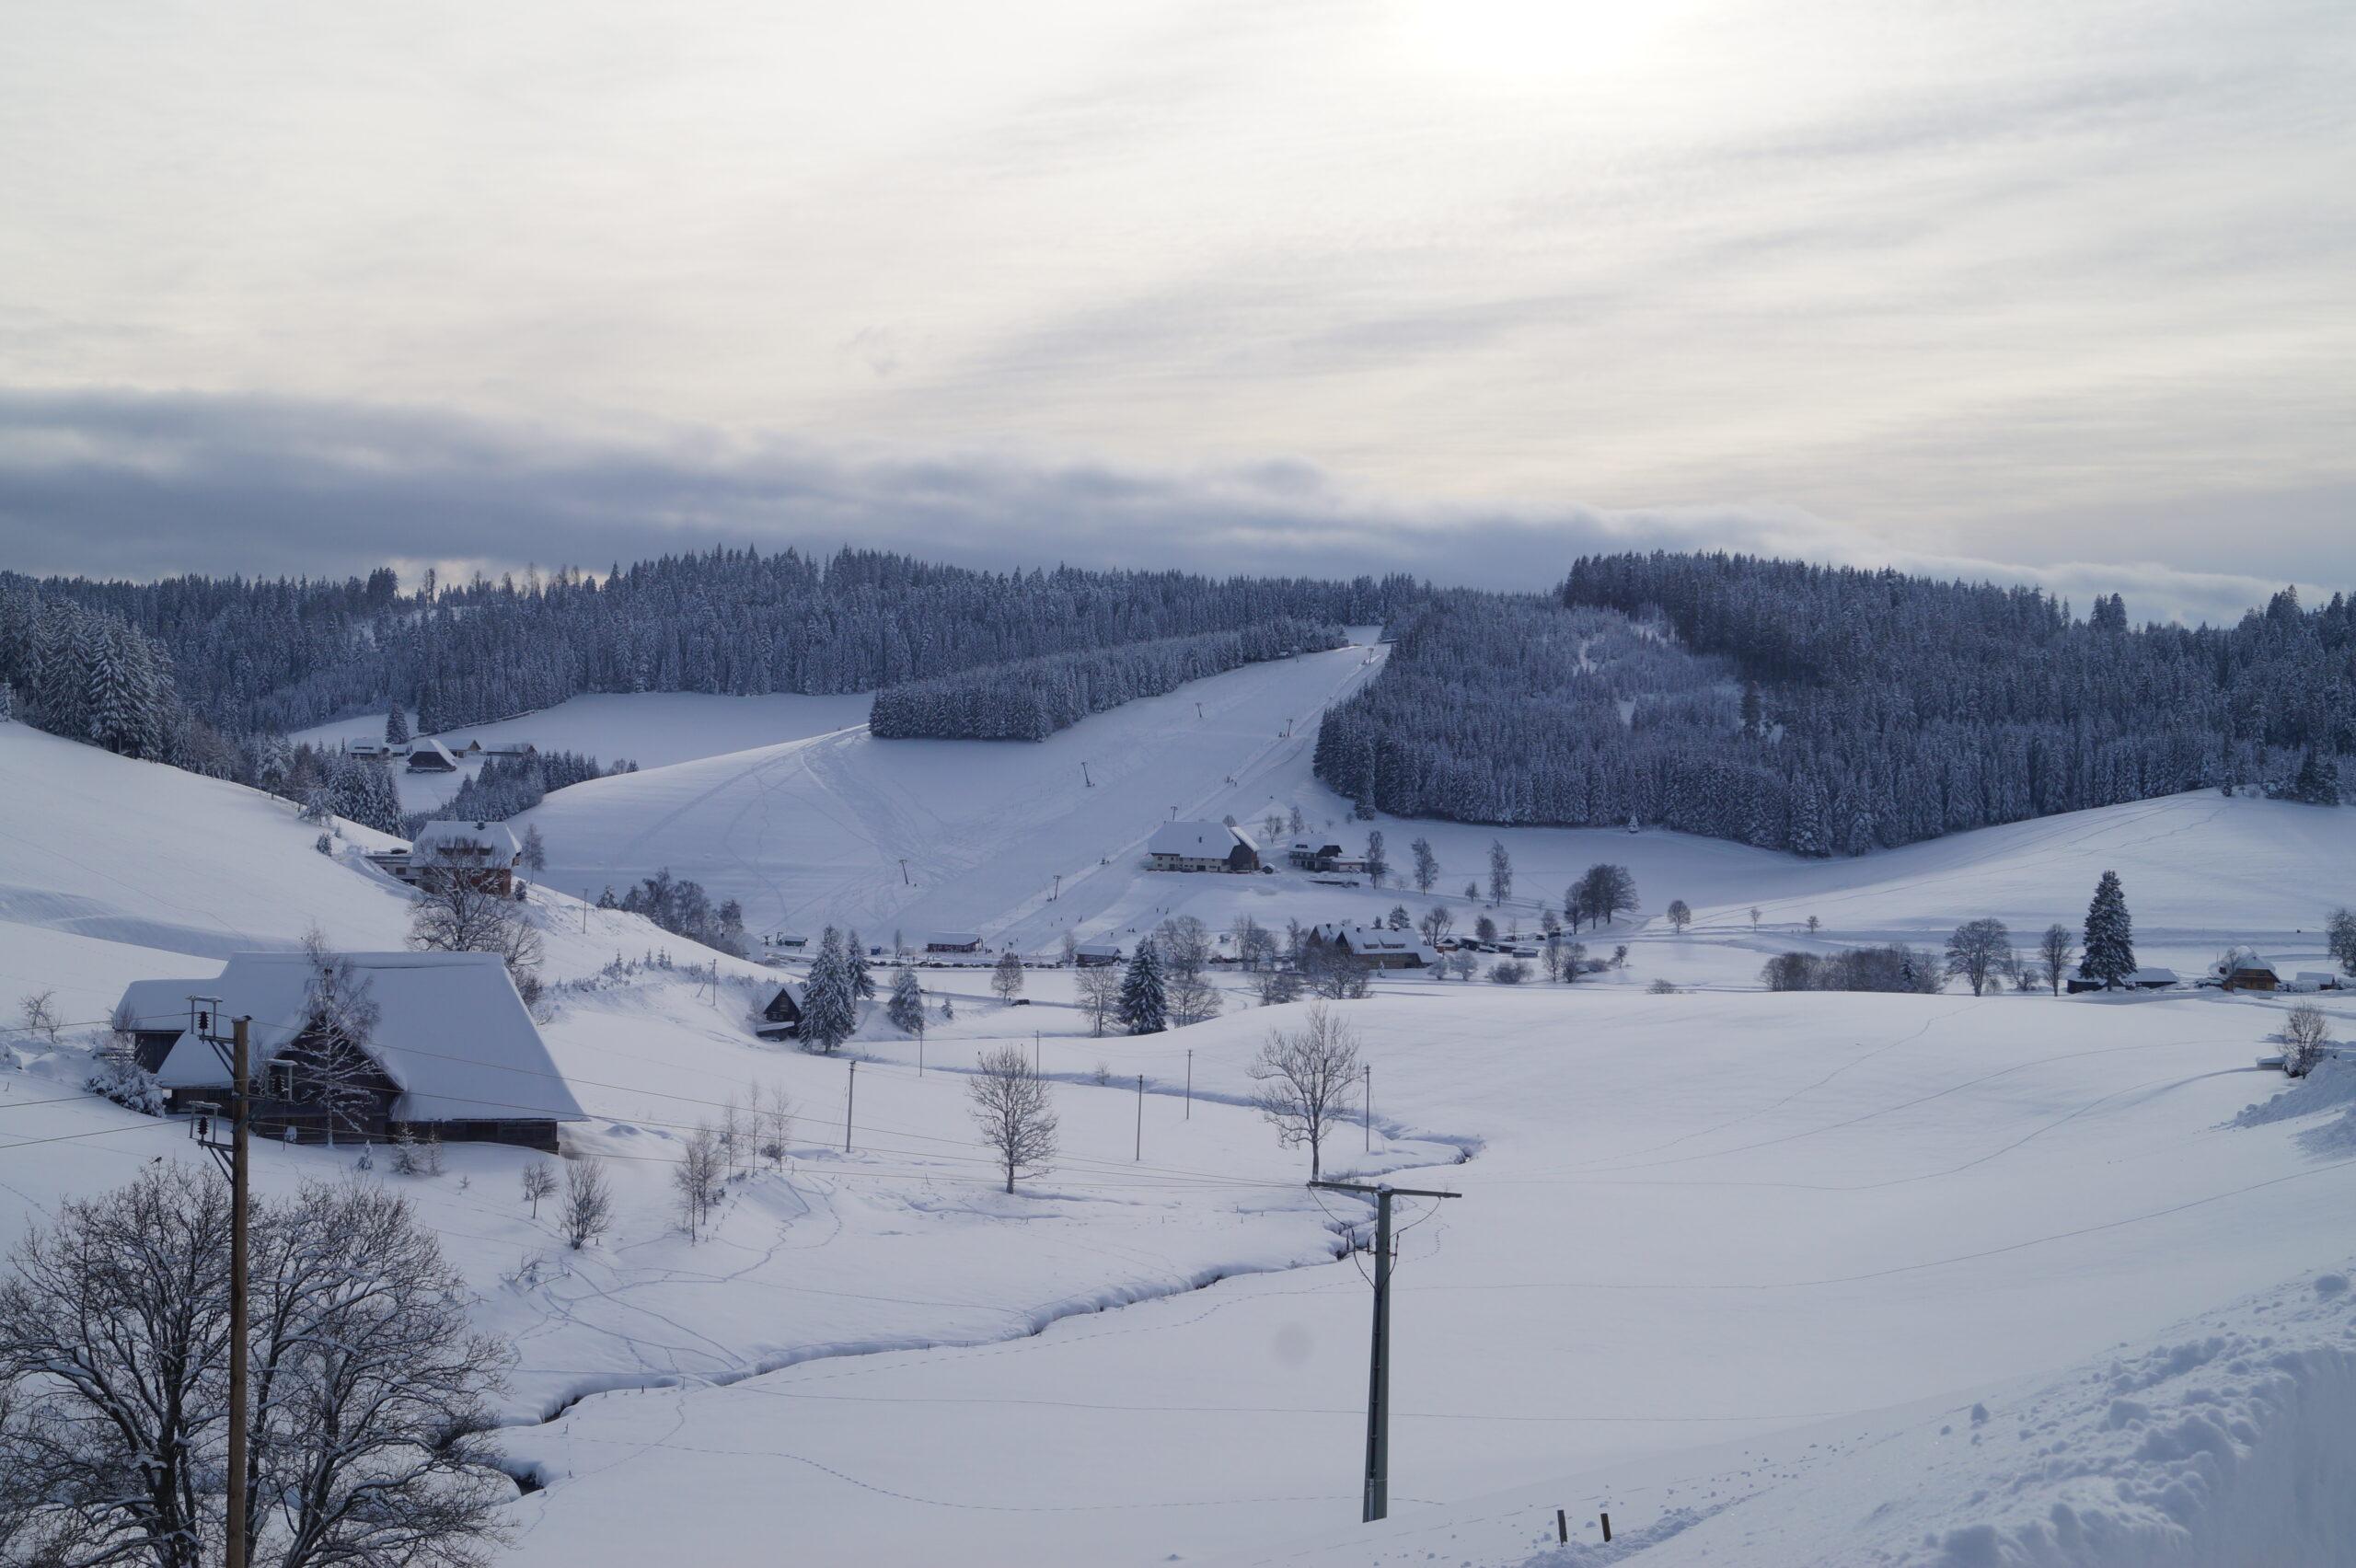 Blick auf den Skilift